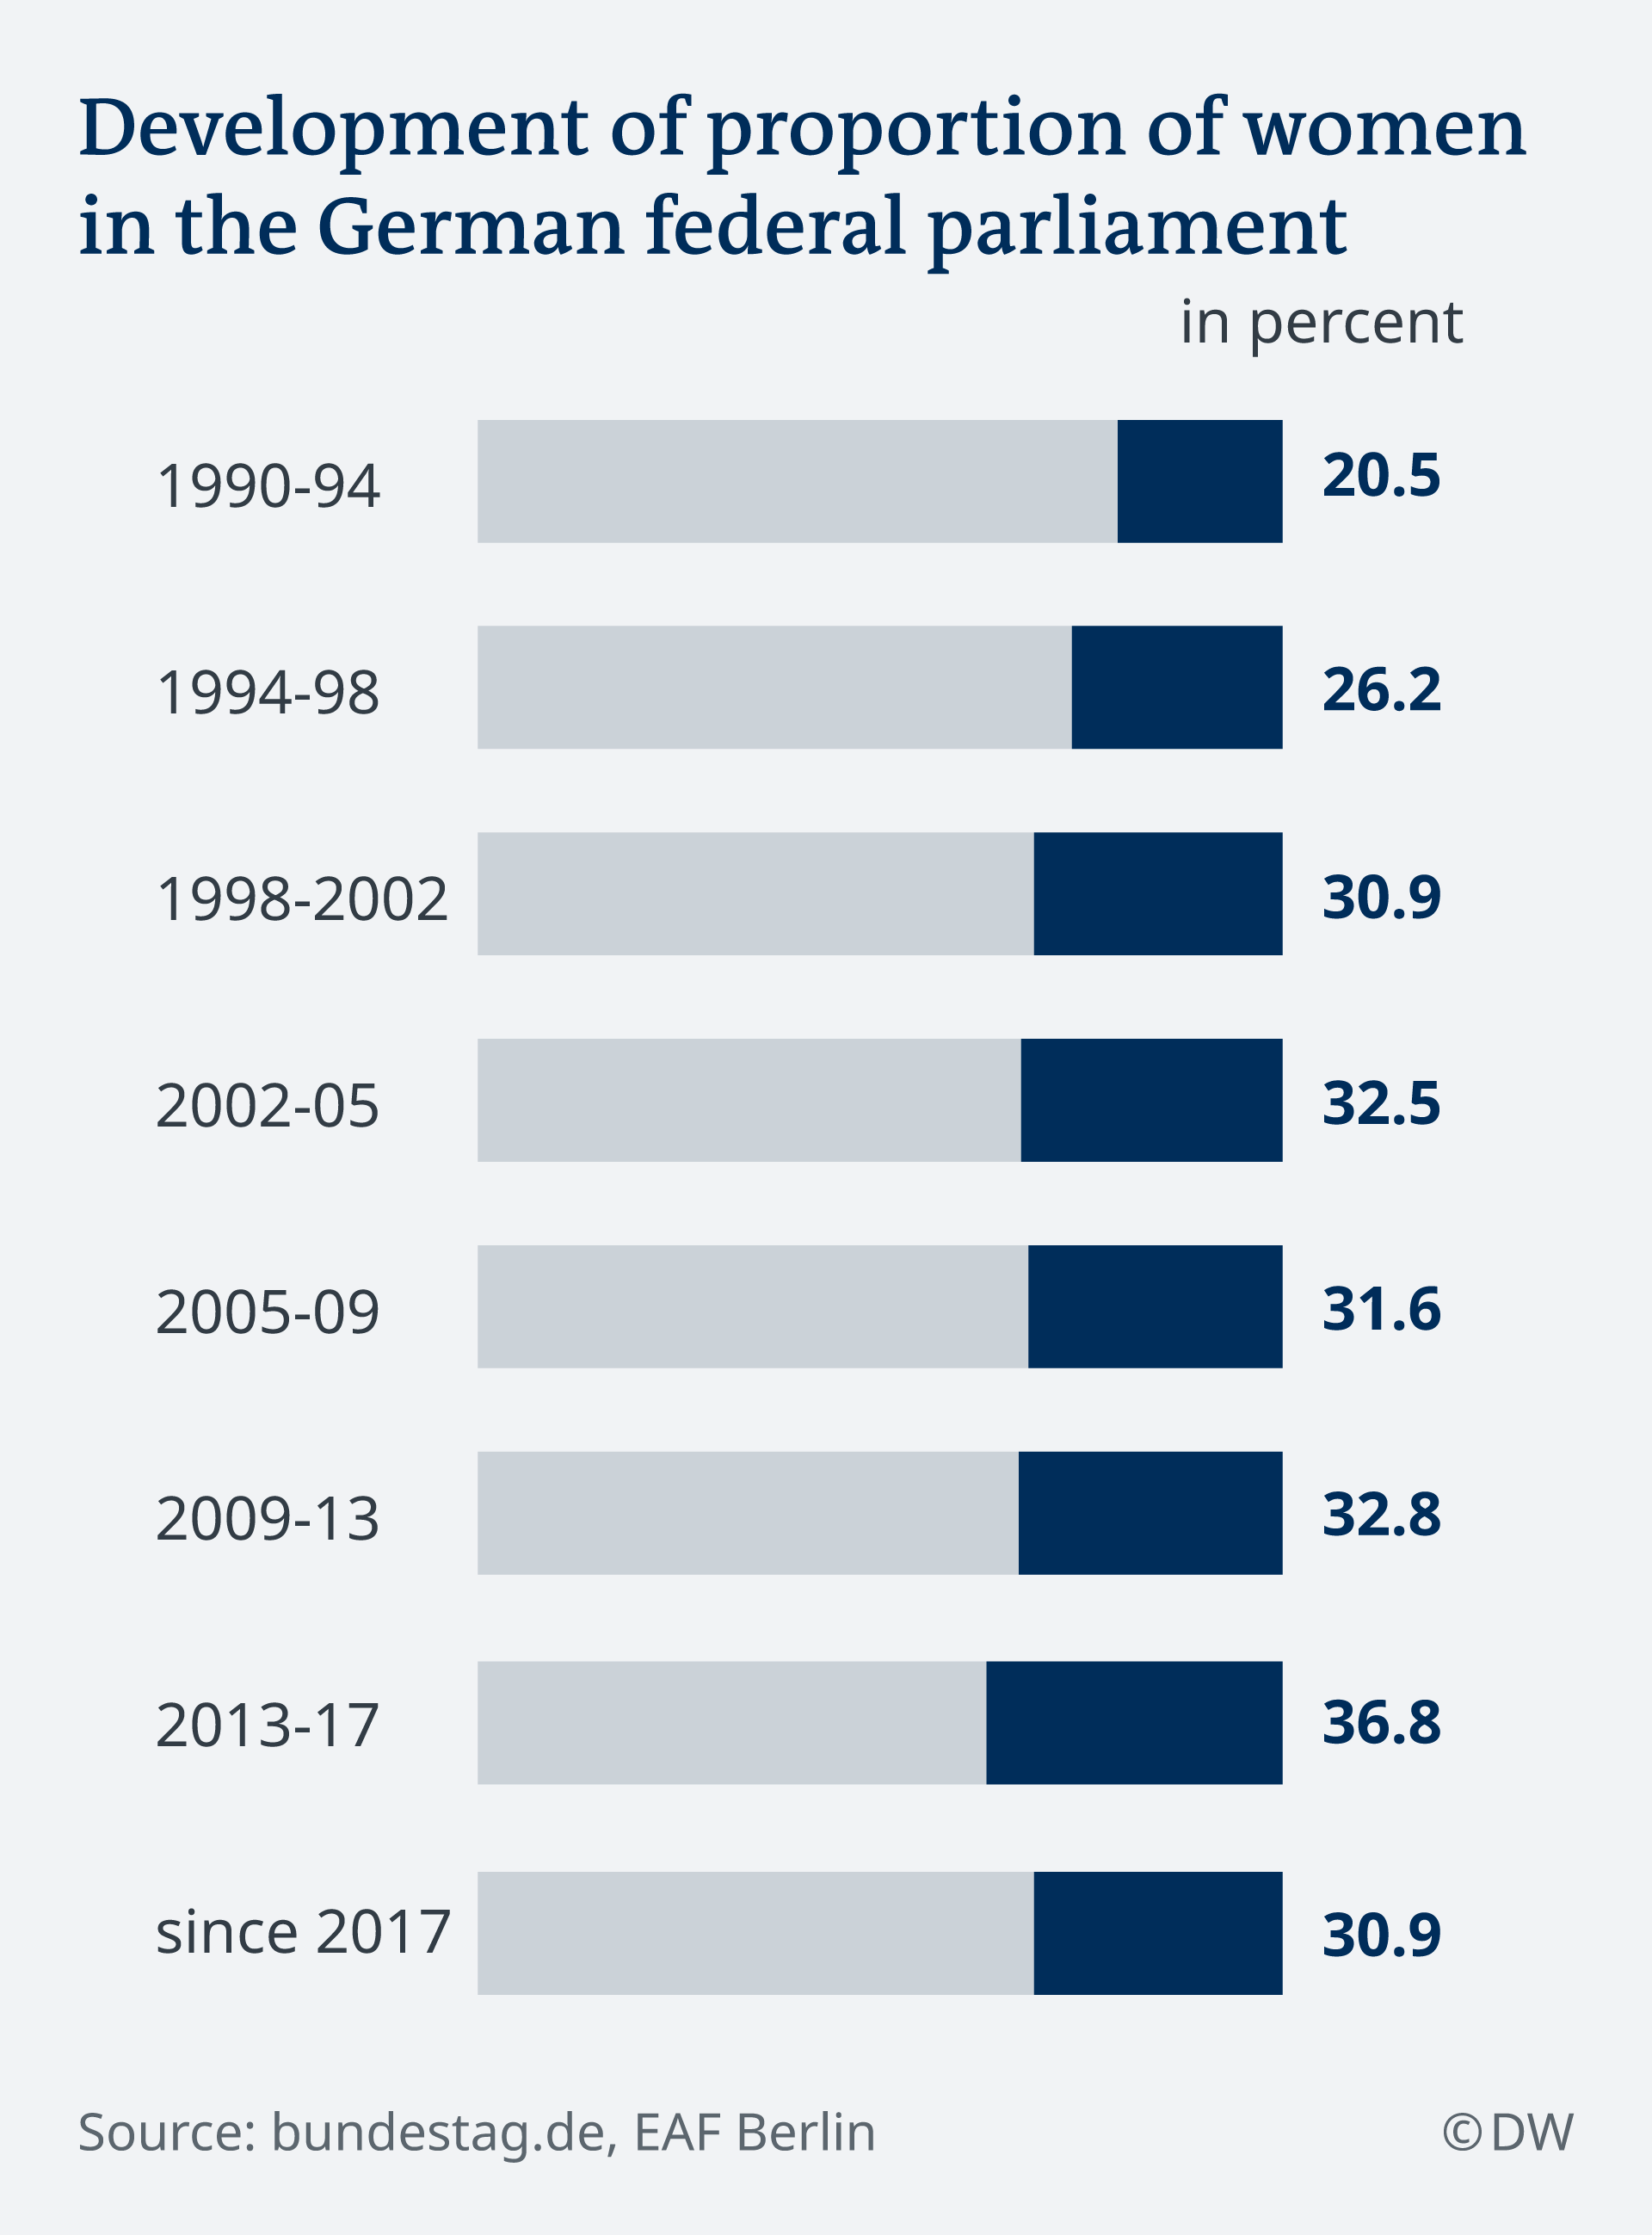 DW Infographic – Women in German parliament 1990-2017